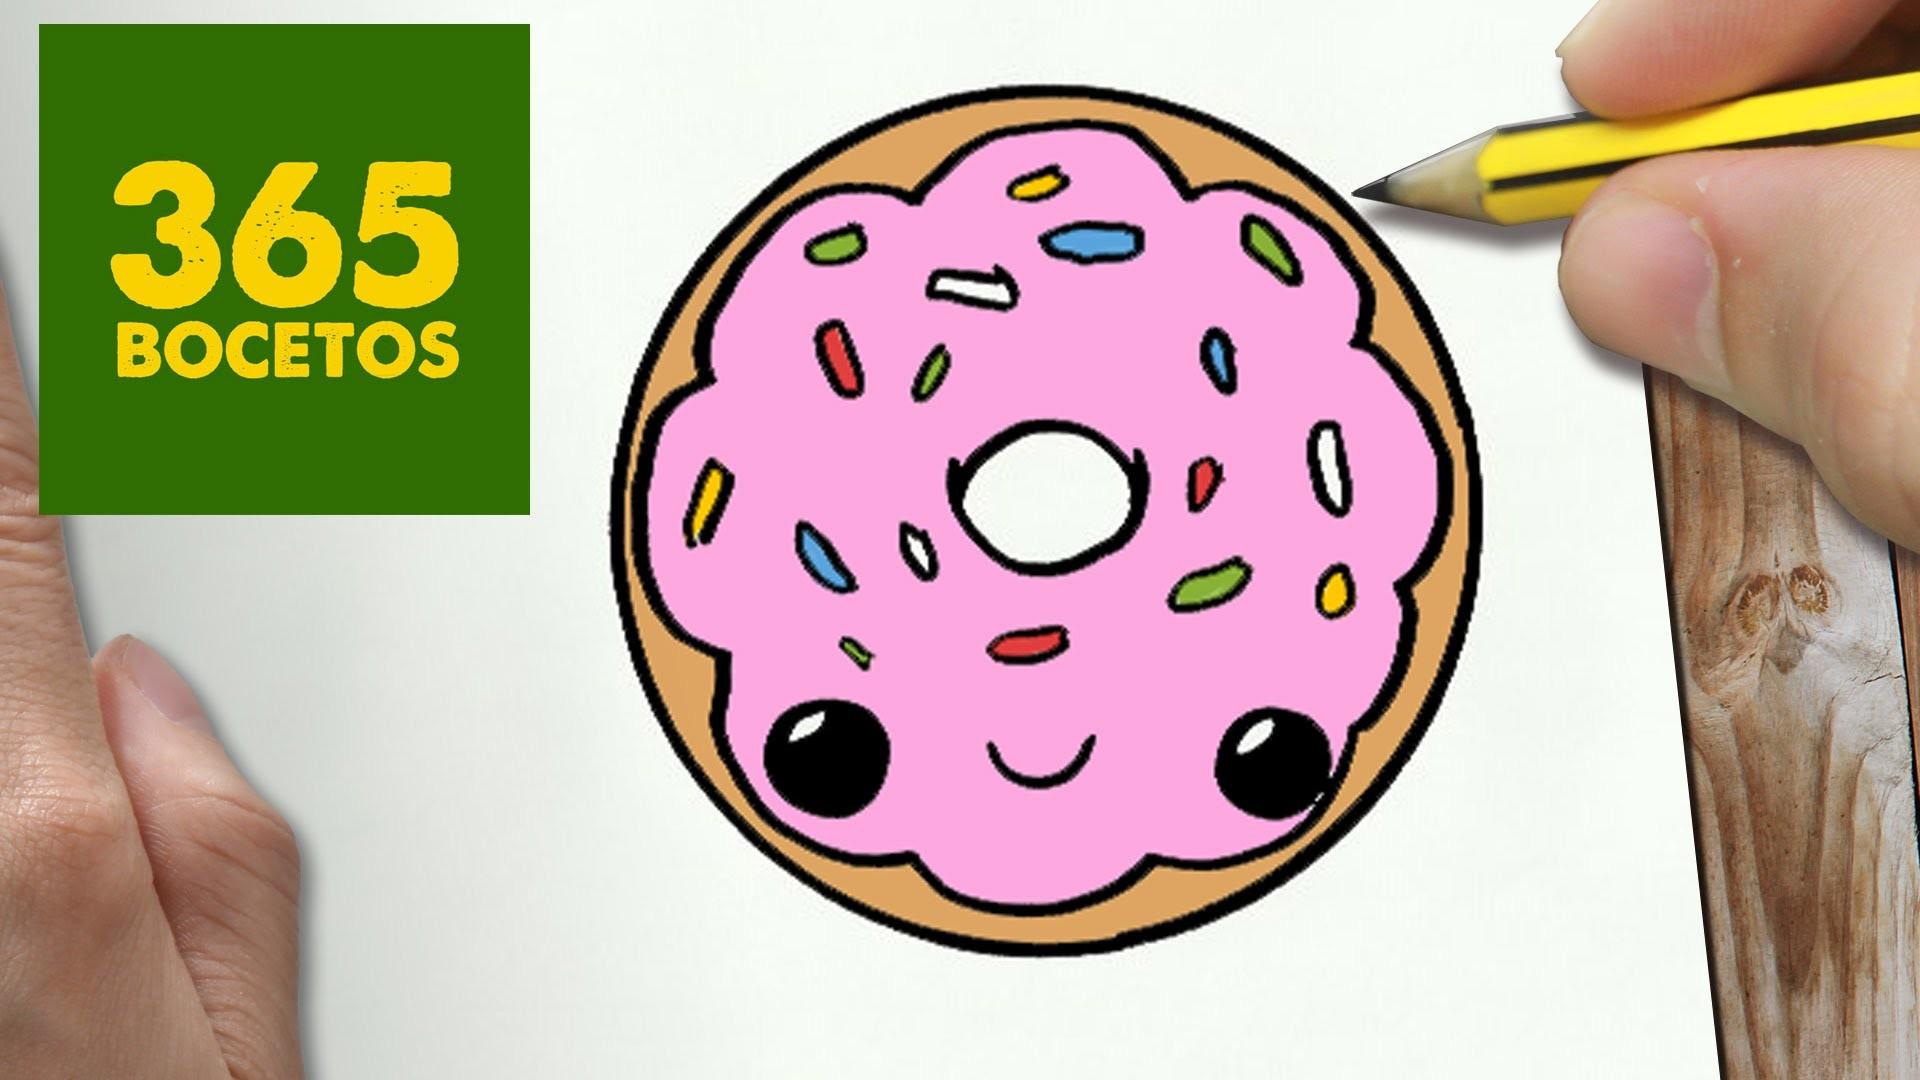 COMO DIBUJAR DONUT KAWAII PASO A PASO - Dibujos kawaii faciles - How to draw a DONUT